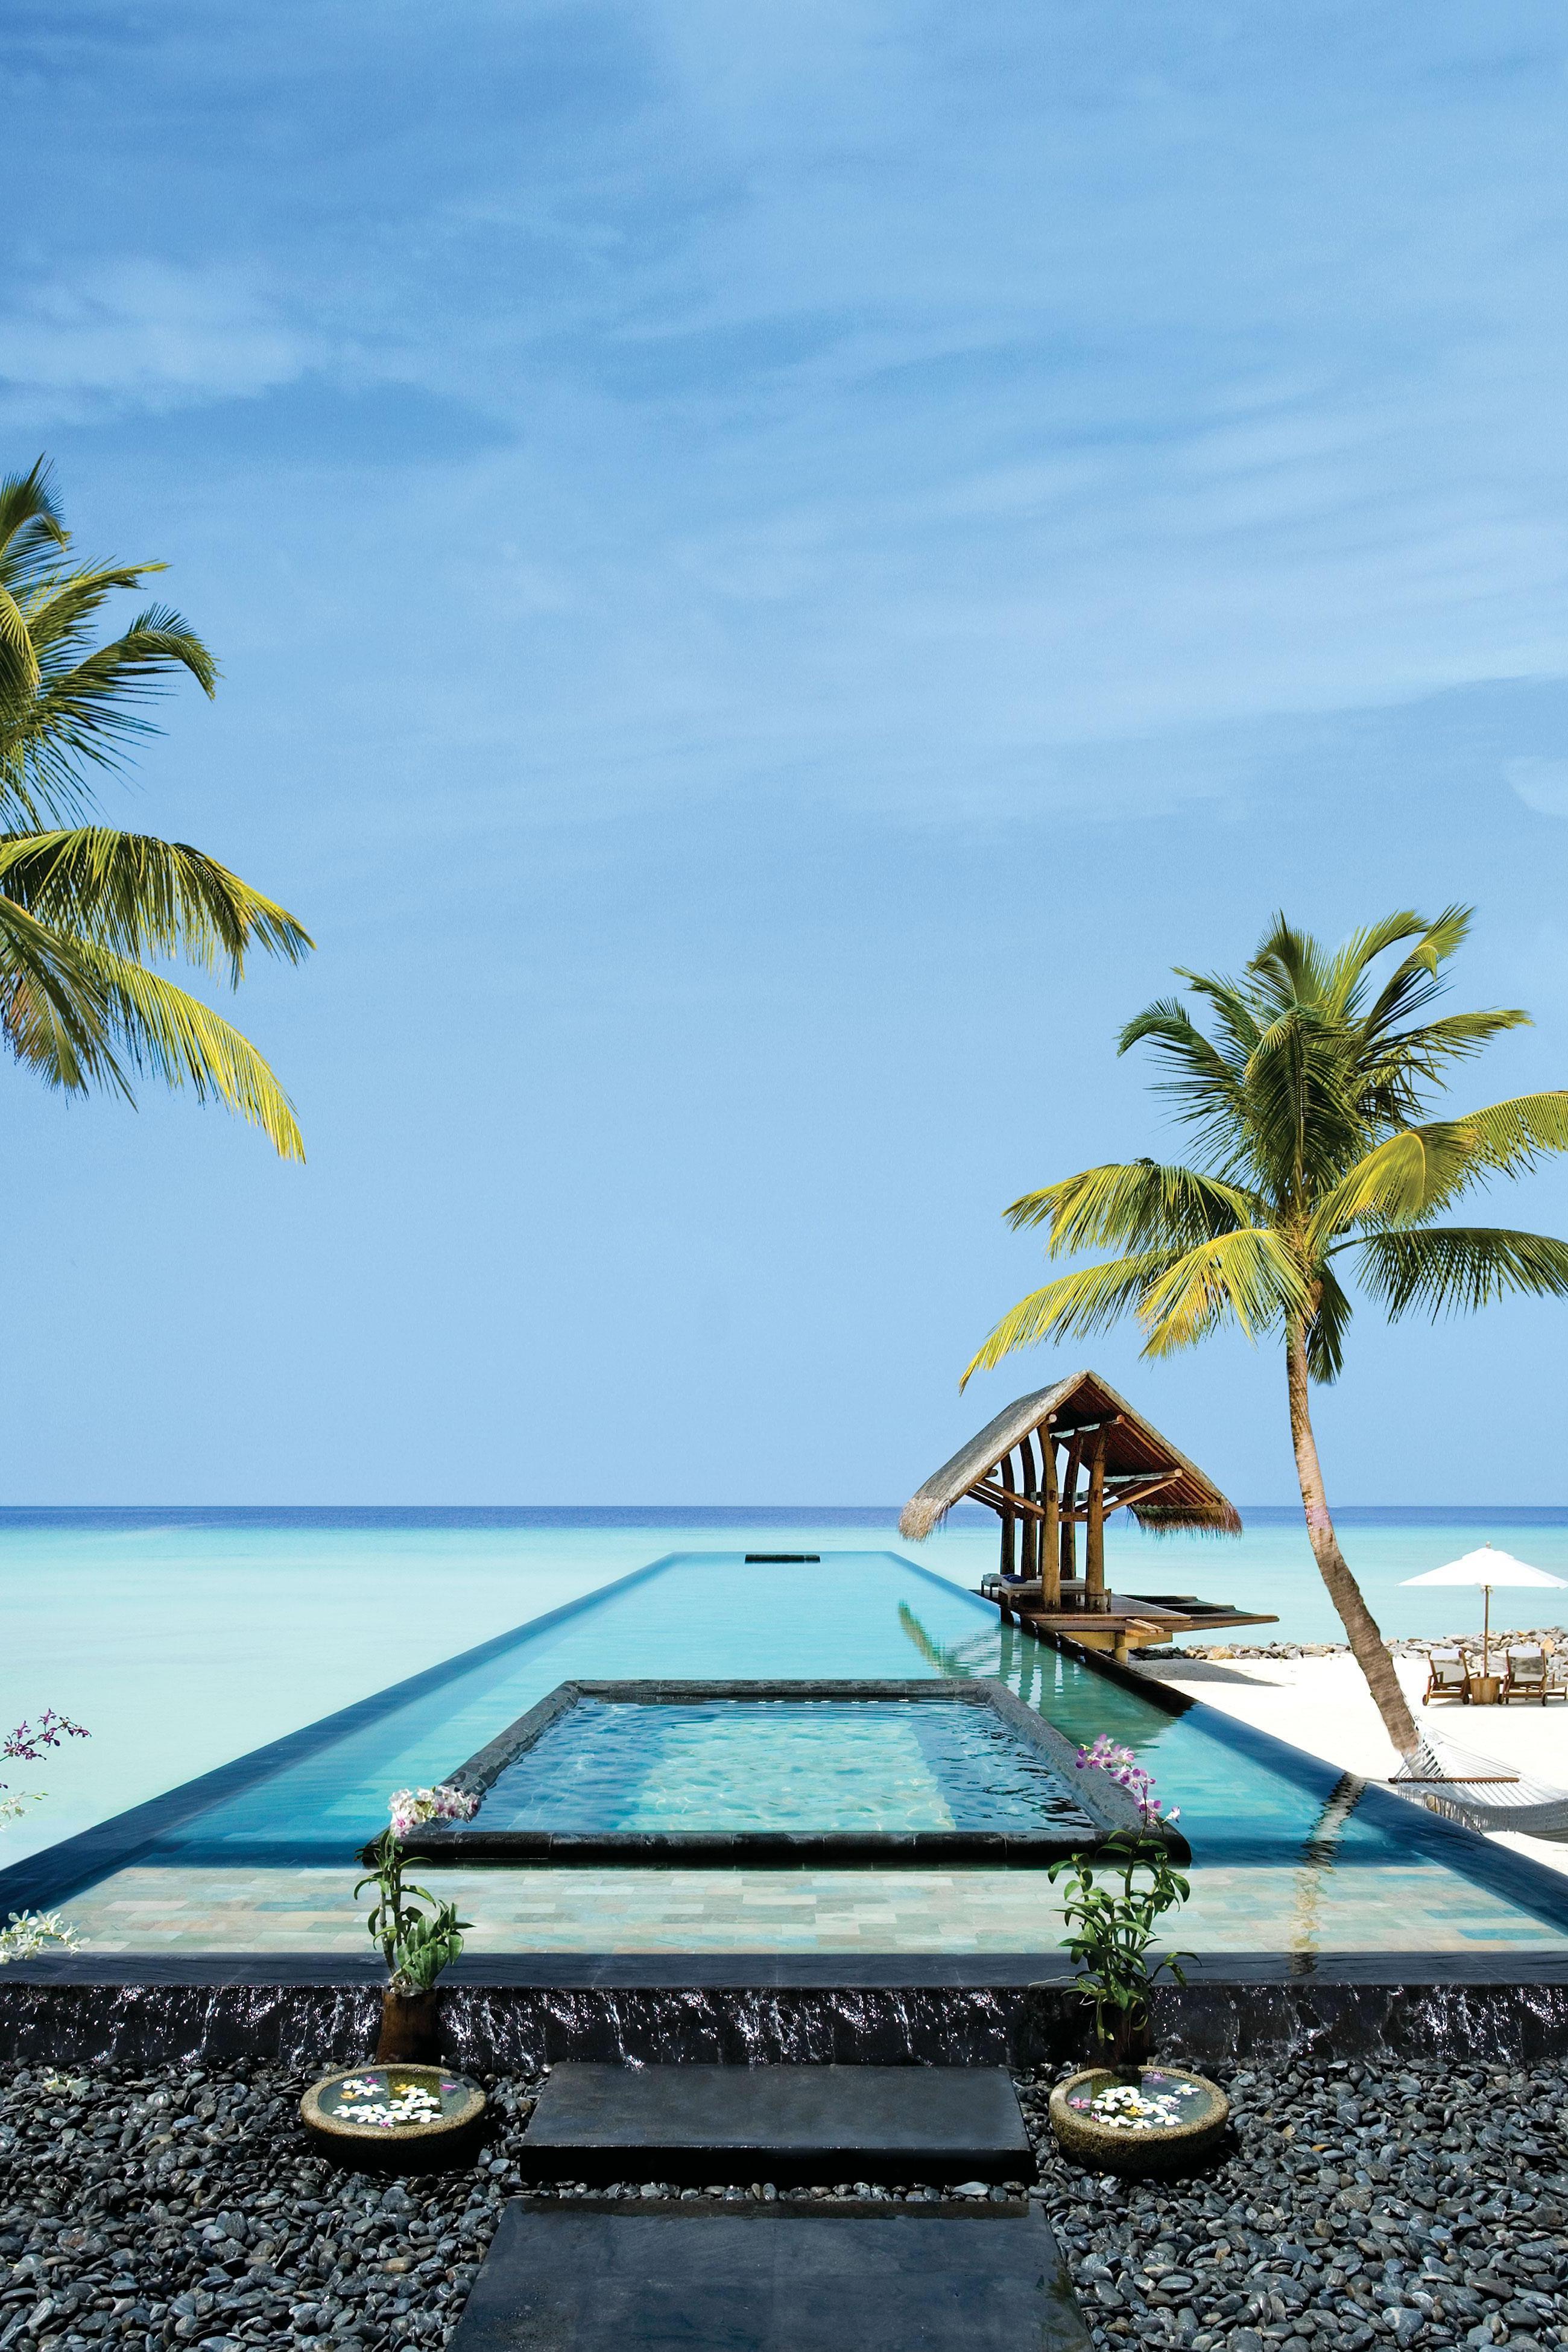 tropical palm beach exotic sand sun coconut island vacationl summer idyllic paradise hotel